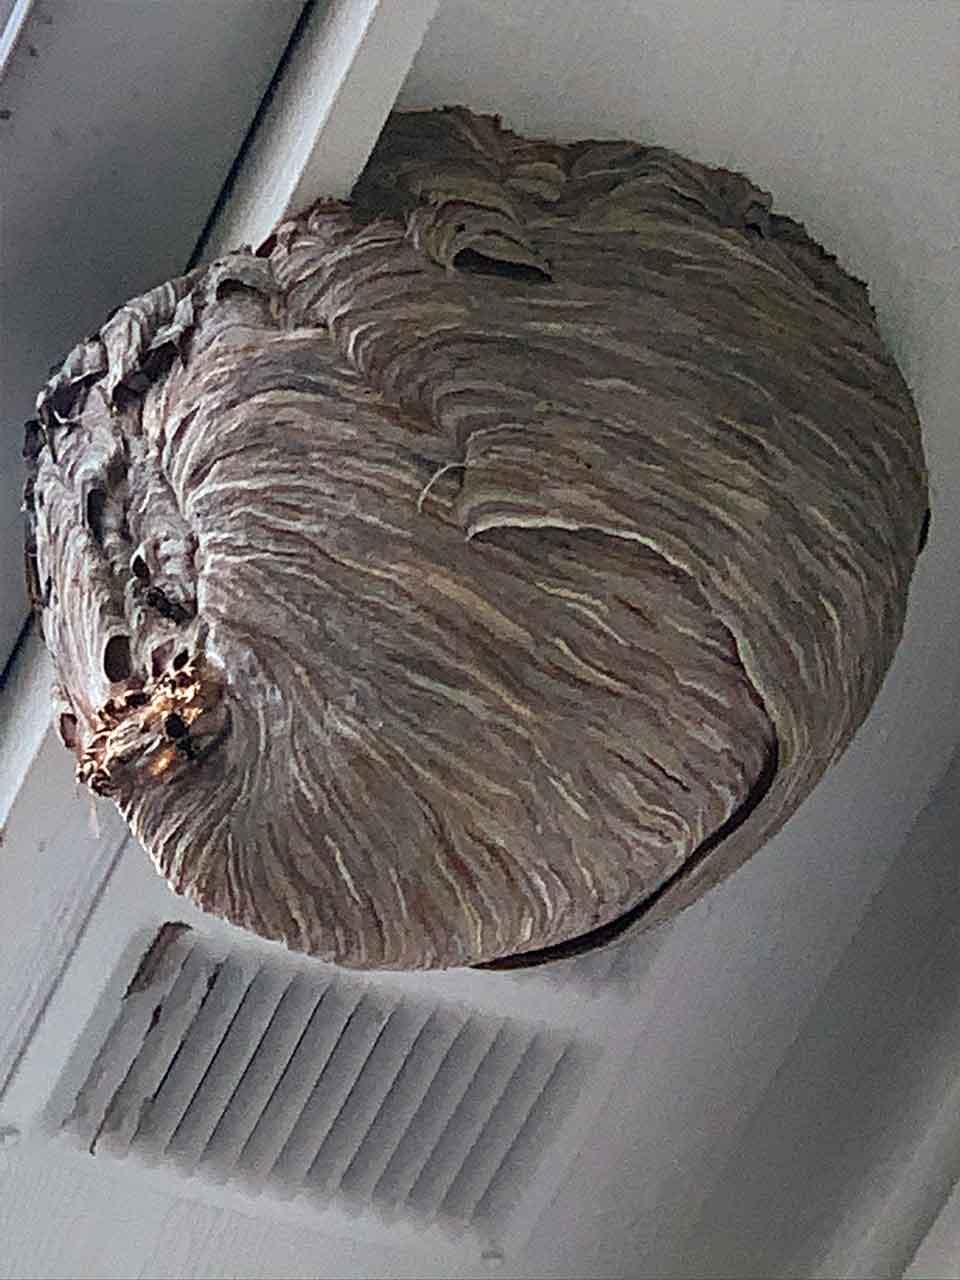 beehive-hornet-nest-removal-extermination-service-pest-control-grand-rapids-mi